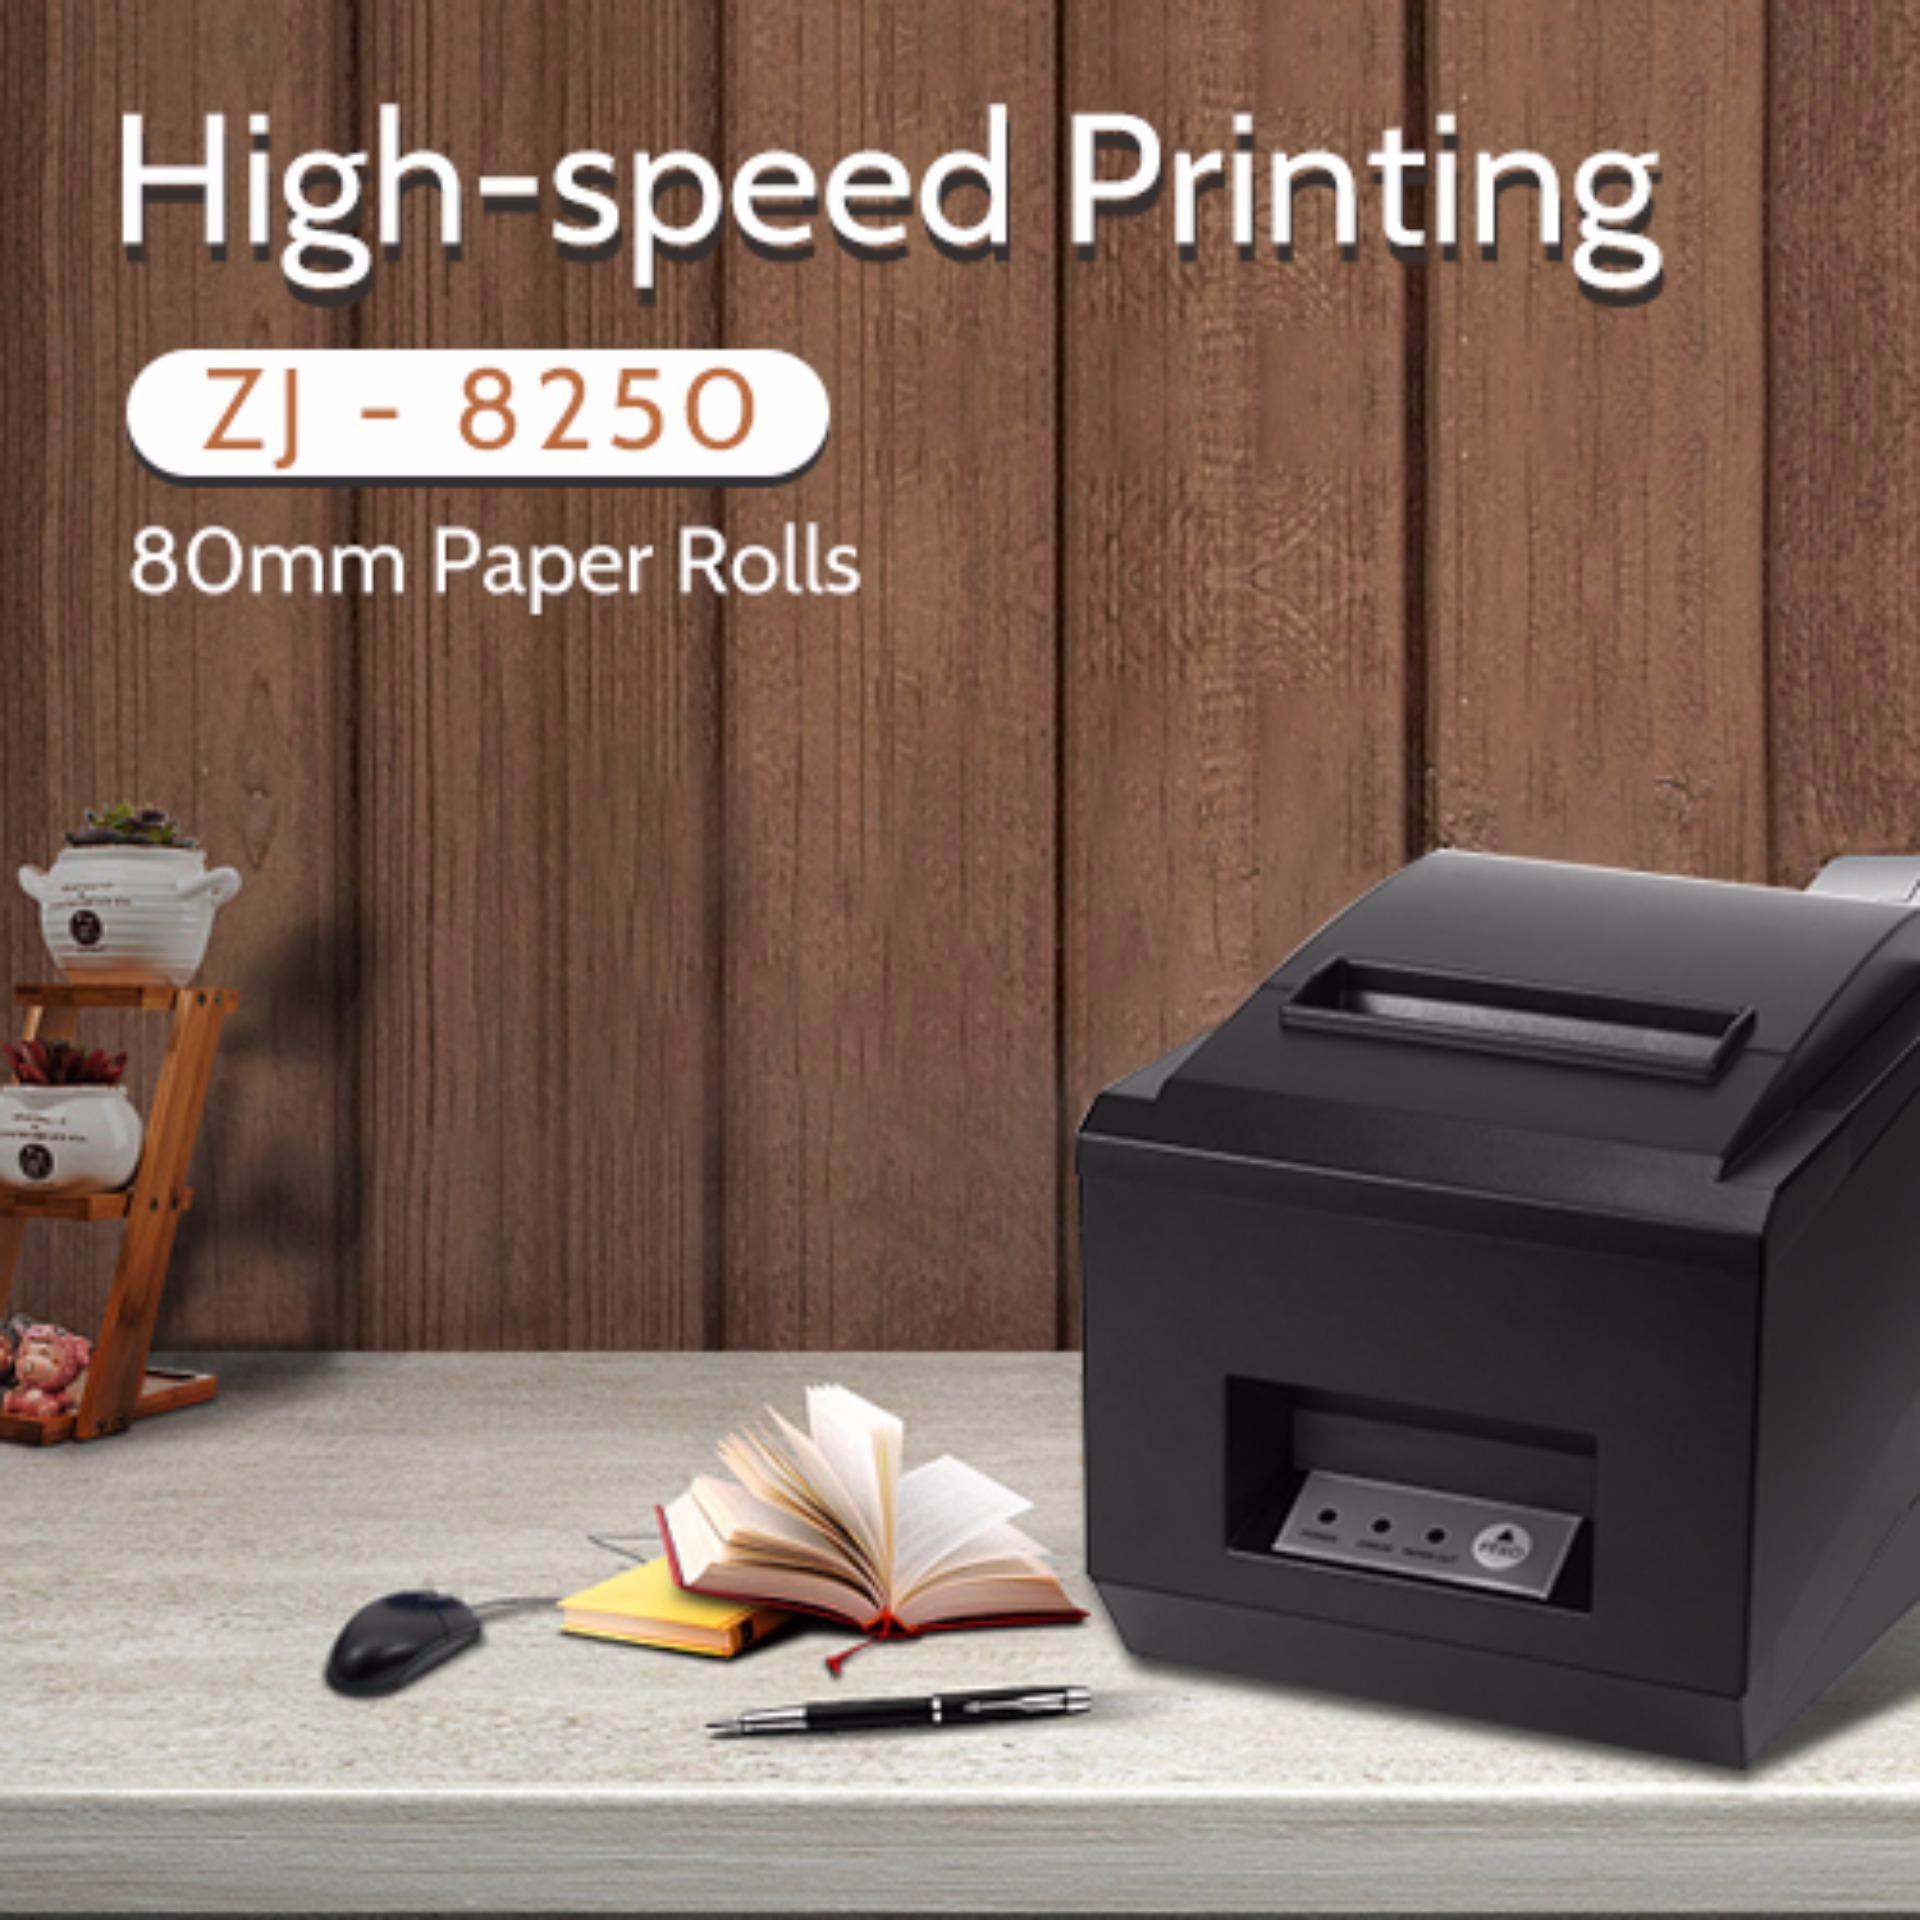 ZJ - 8250 POS Receipt Thermal Printer with 80mm Paper Rolls High-speed  Printing US PLUG - intl